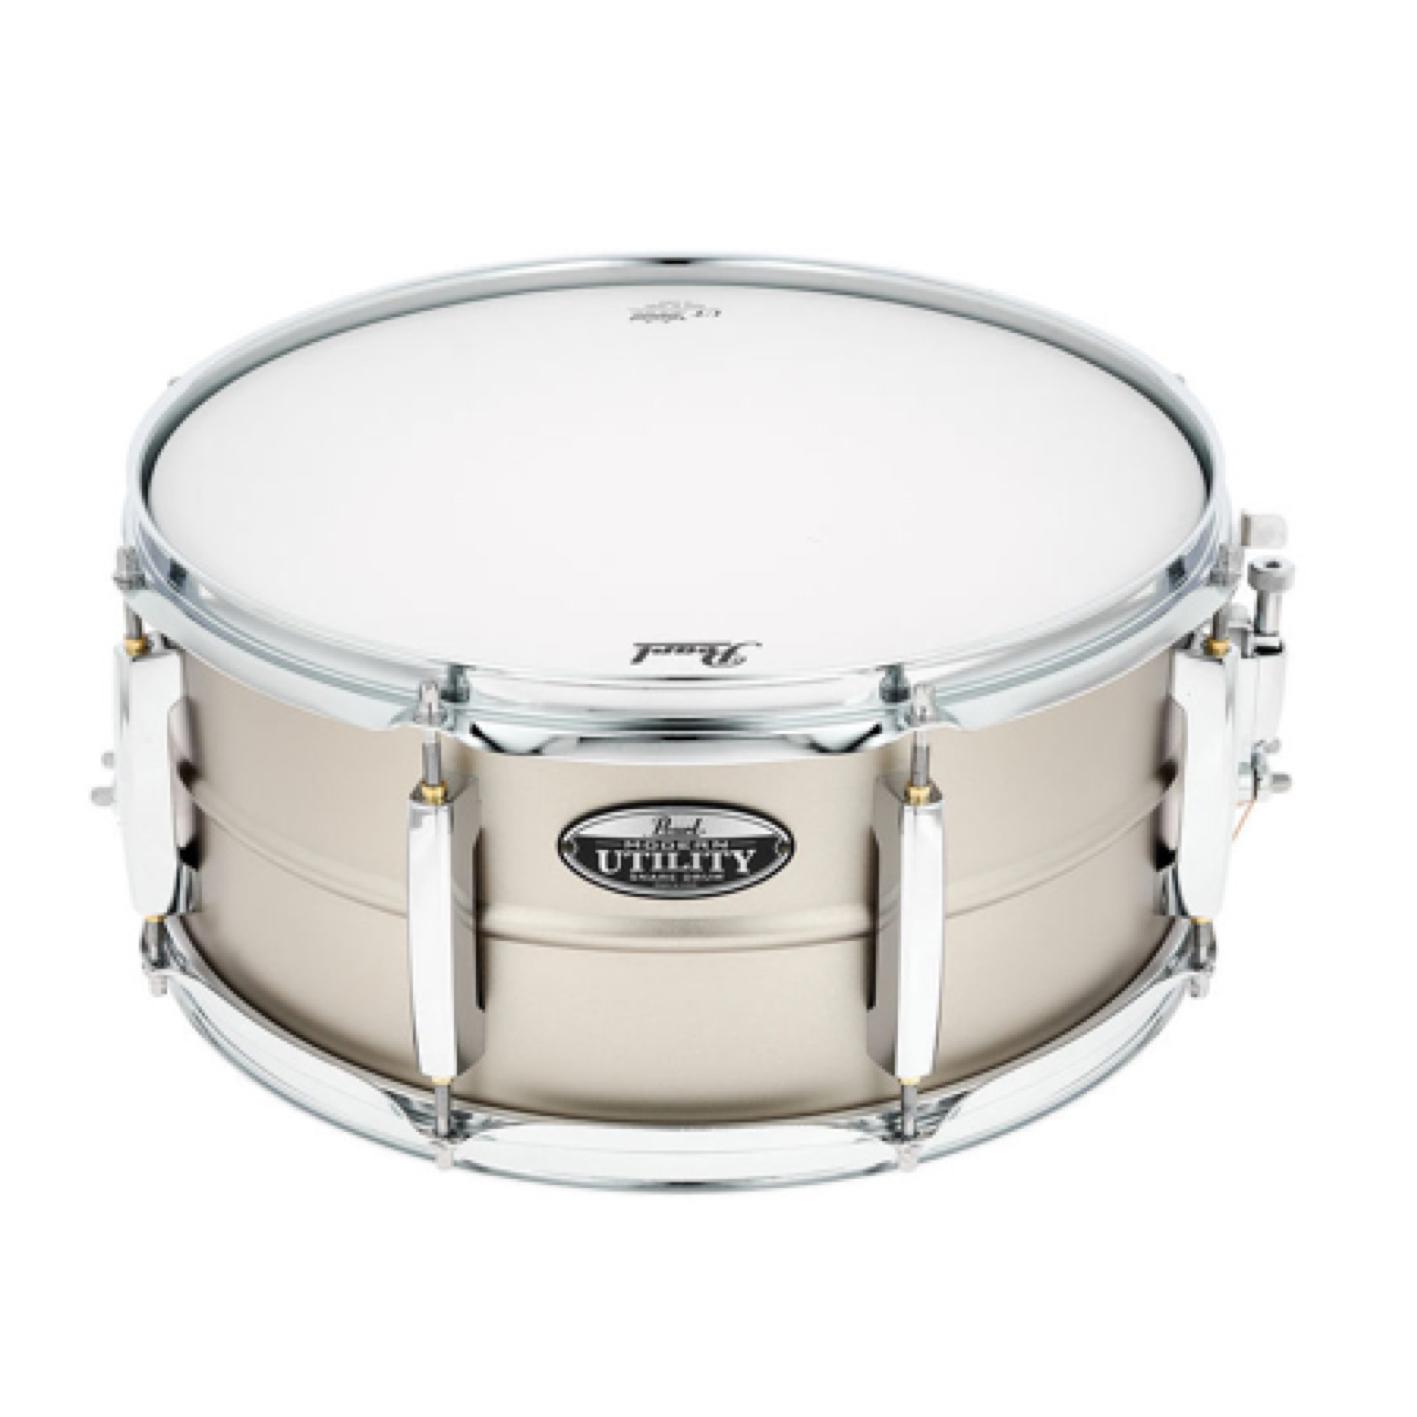 "Pearl Modern Utility 14"" x 6.5"" Steel Snare Drum"